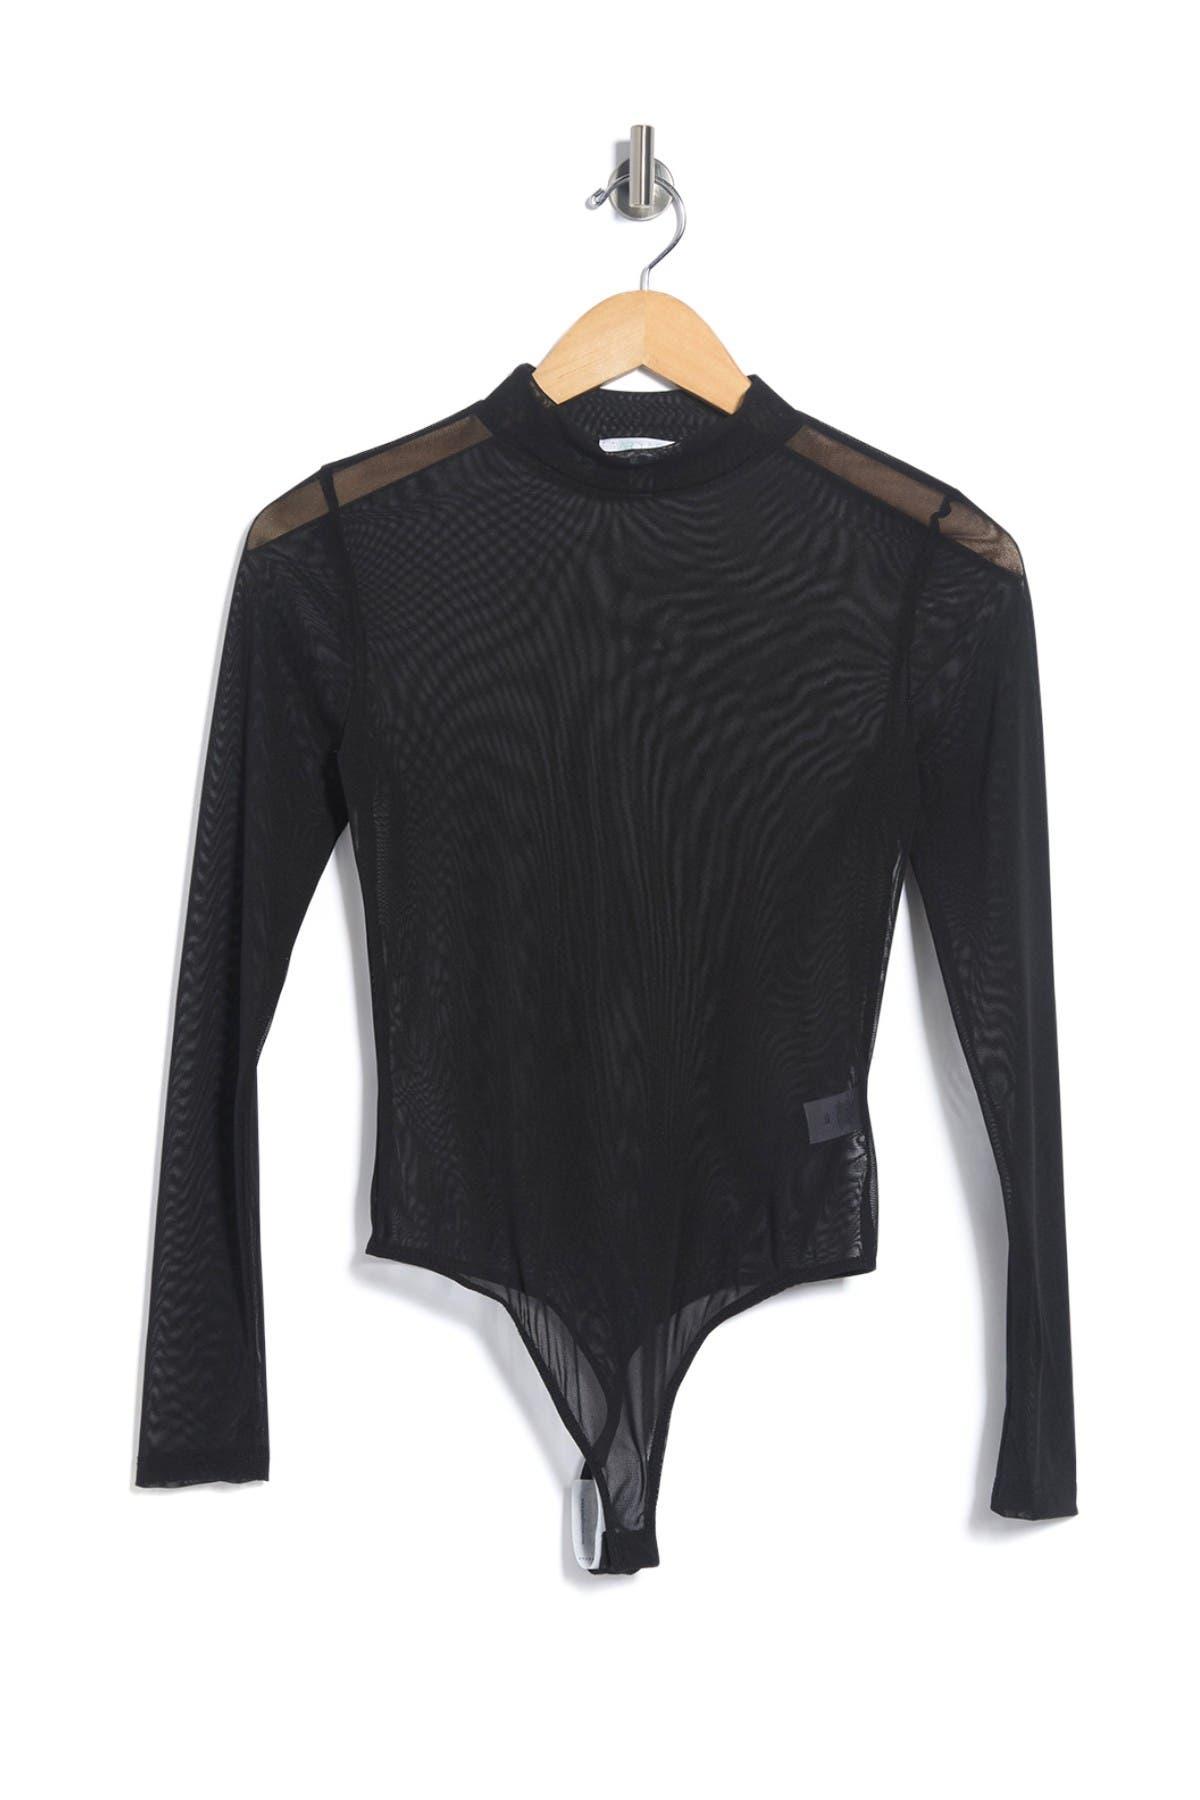 Image of Abound Long Sleeve Mock Neck Mesh Bodysuit